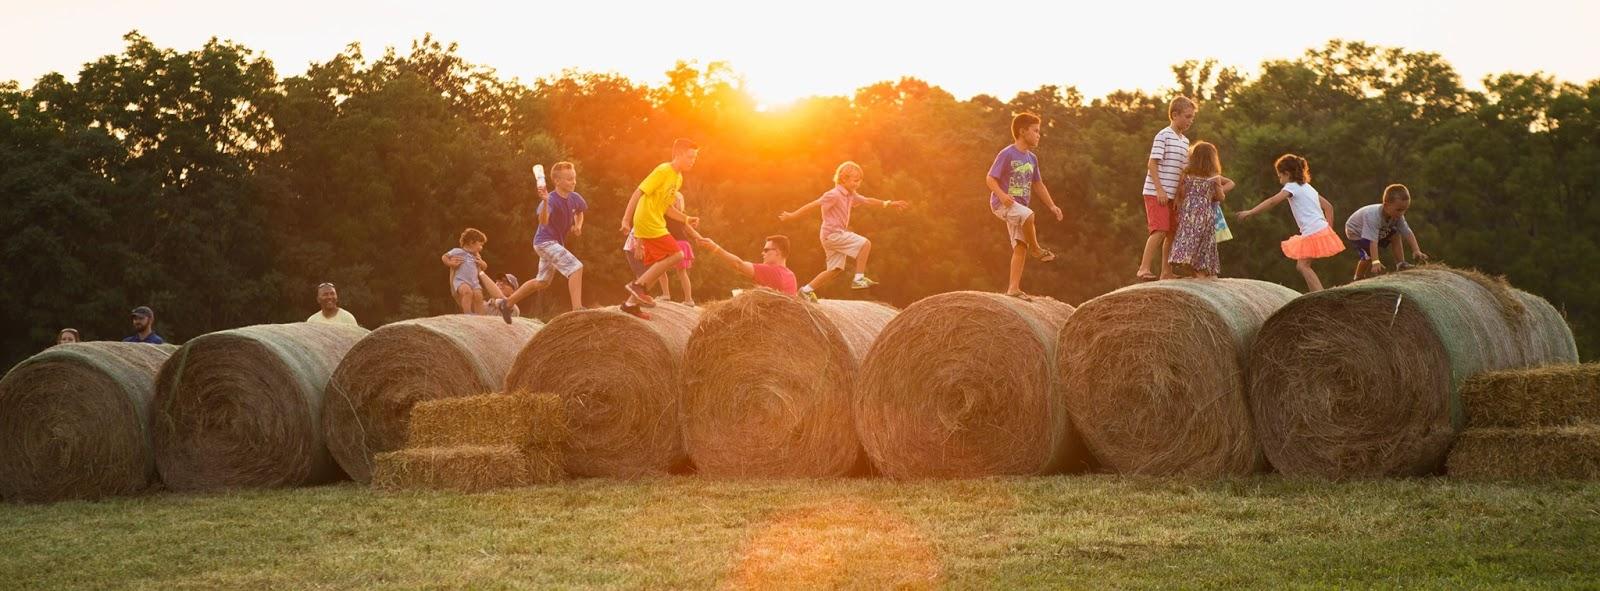 foxhollow-farm-fall-festival-crestwood-ky